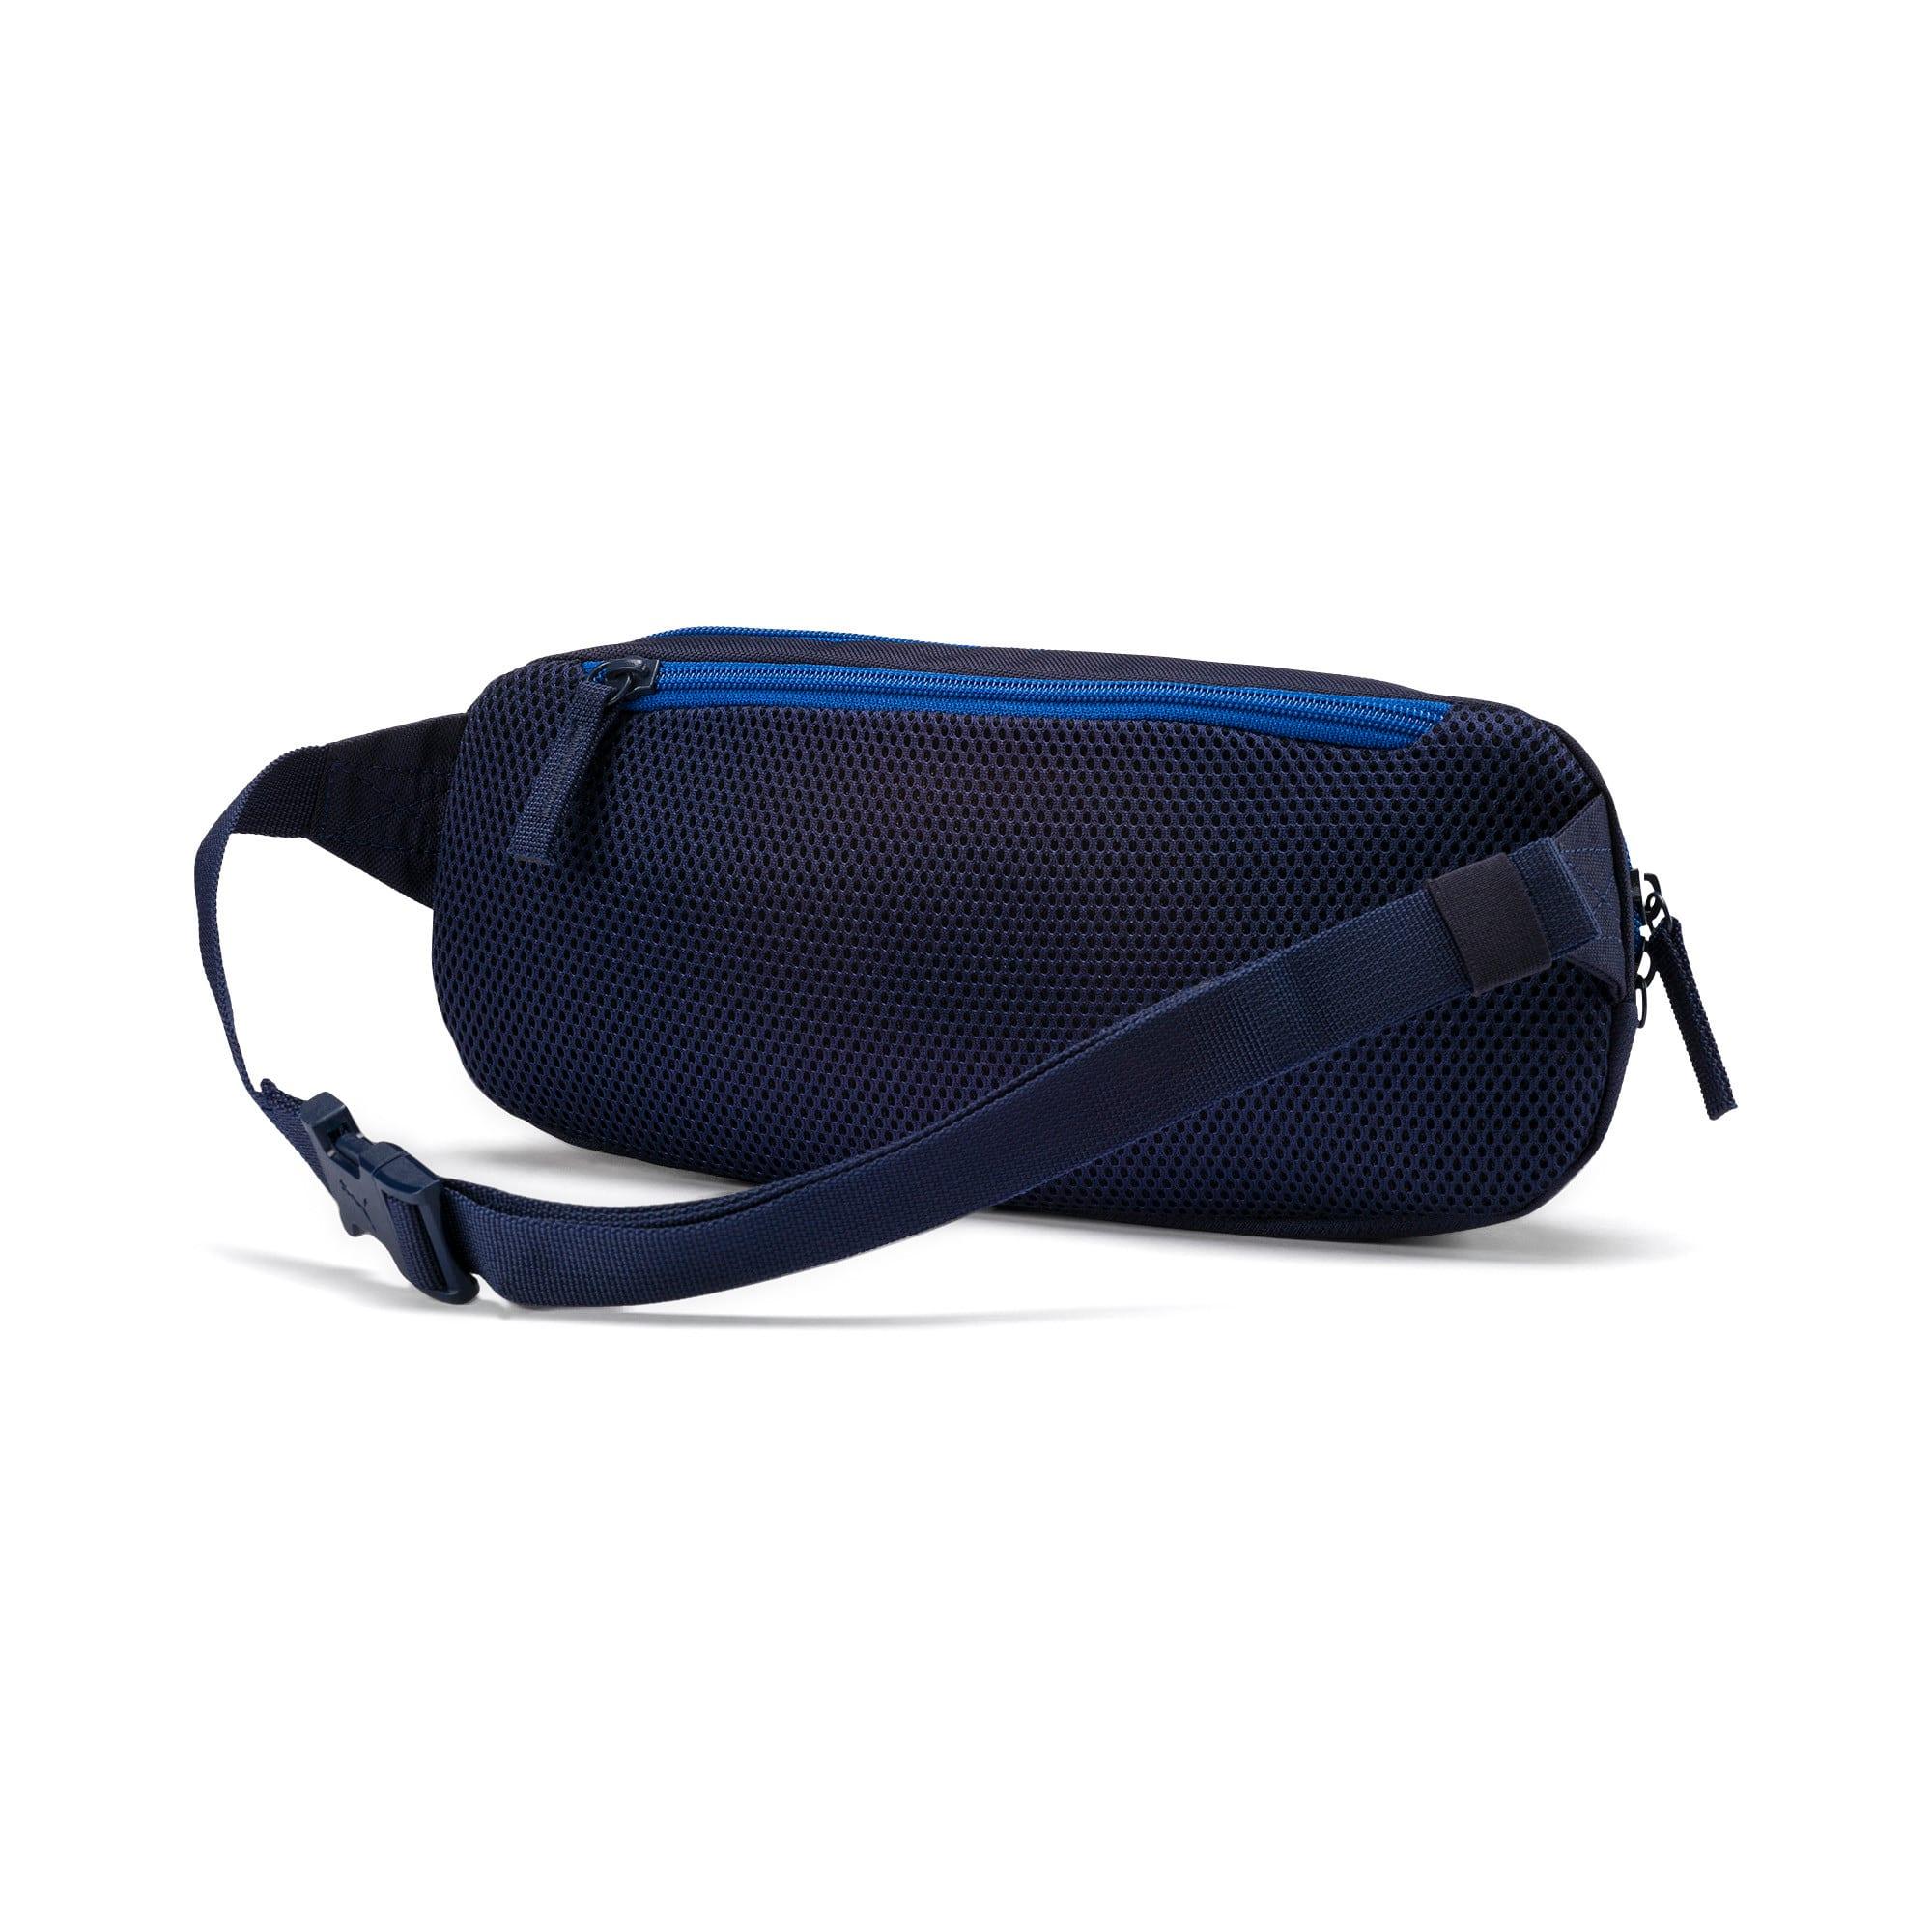 Miniatura 2 de Bolso pequeño para cintura PUMA X Multi, Peacoat-Galaxy Blue, mediano